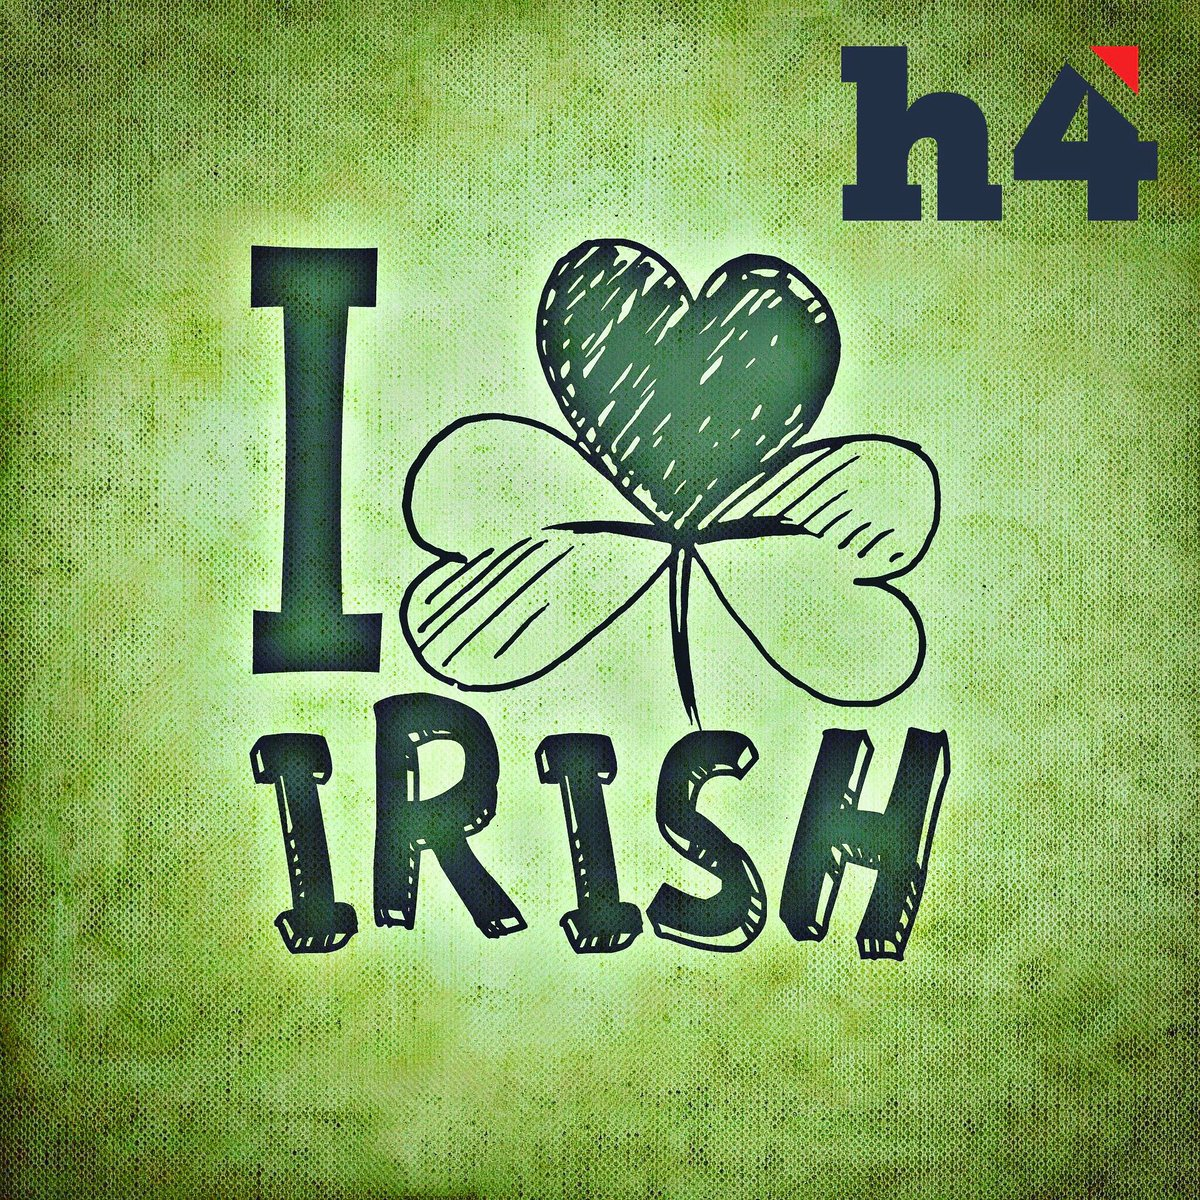 A pesar de la situación, le ponemos buena cara a los acontecimientos y deseamos HAPPY ST. PATRICK DAY TO ALL OUR IRISH FRIENDS!   Despite the situation, we try to see the bright side of things, so HAPPY ST. PATRICK DAY TO ALL OUR IRISH FRIENDS!  #juntospodemoscontodo #h4idiomas pic.twitter.com/rOhE4y80Yr